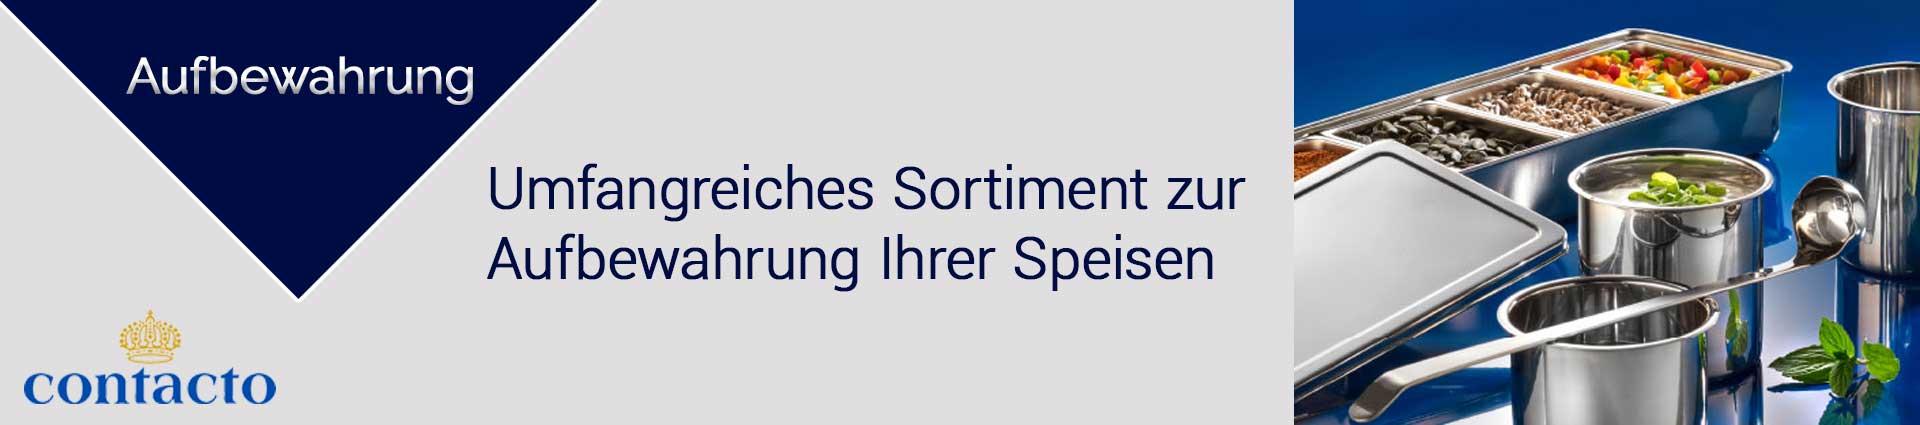 Contacto Aufbewahrung Banner